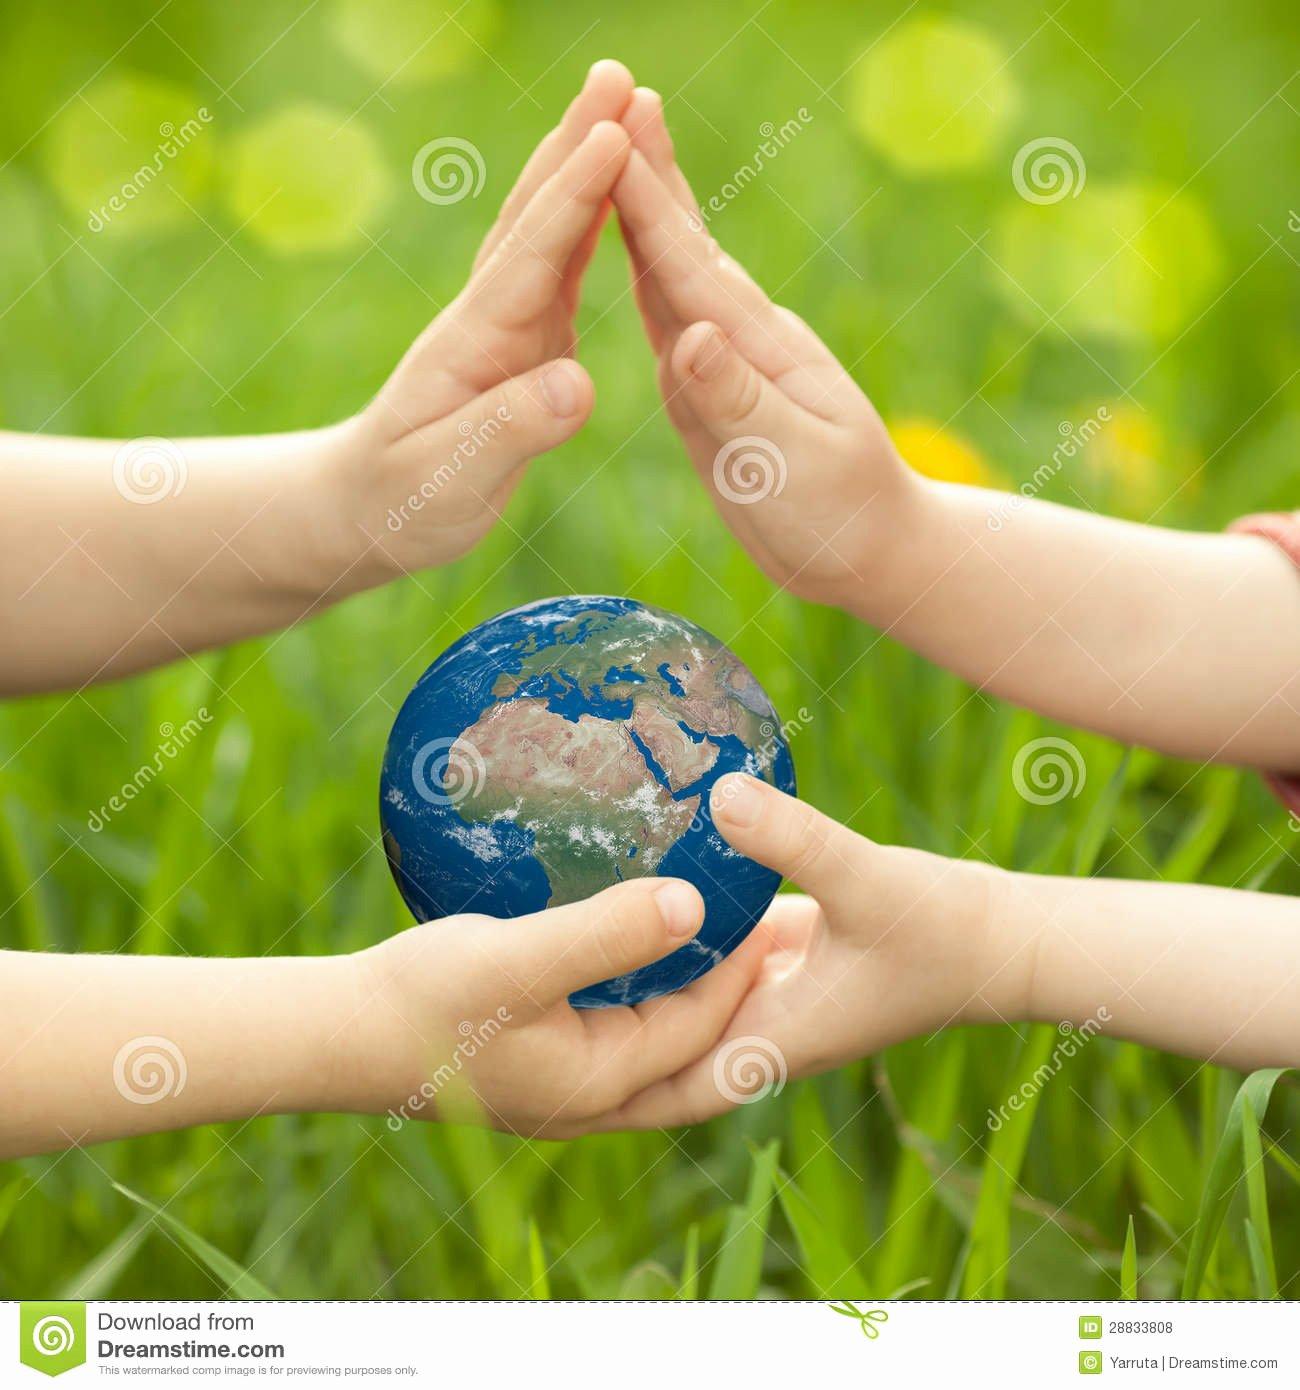 Nature Vs Nurture Venn Diagram Best Of Earth In Children S Hands Royalty Free Stock S